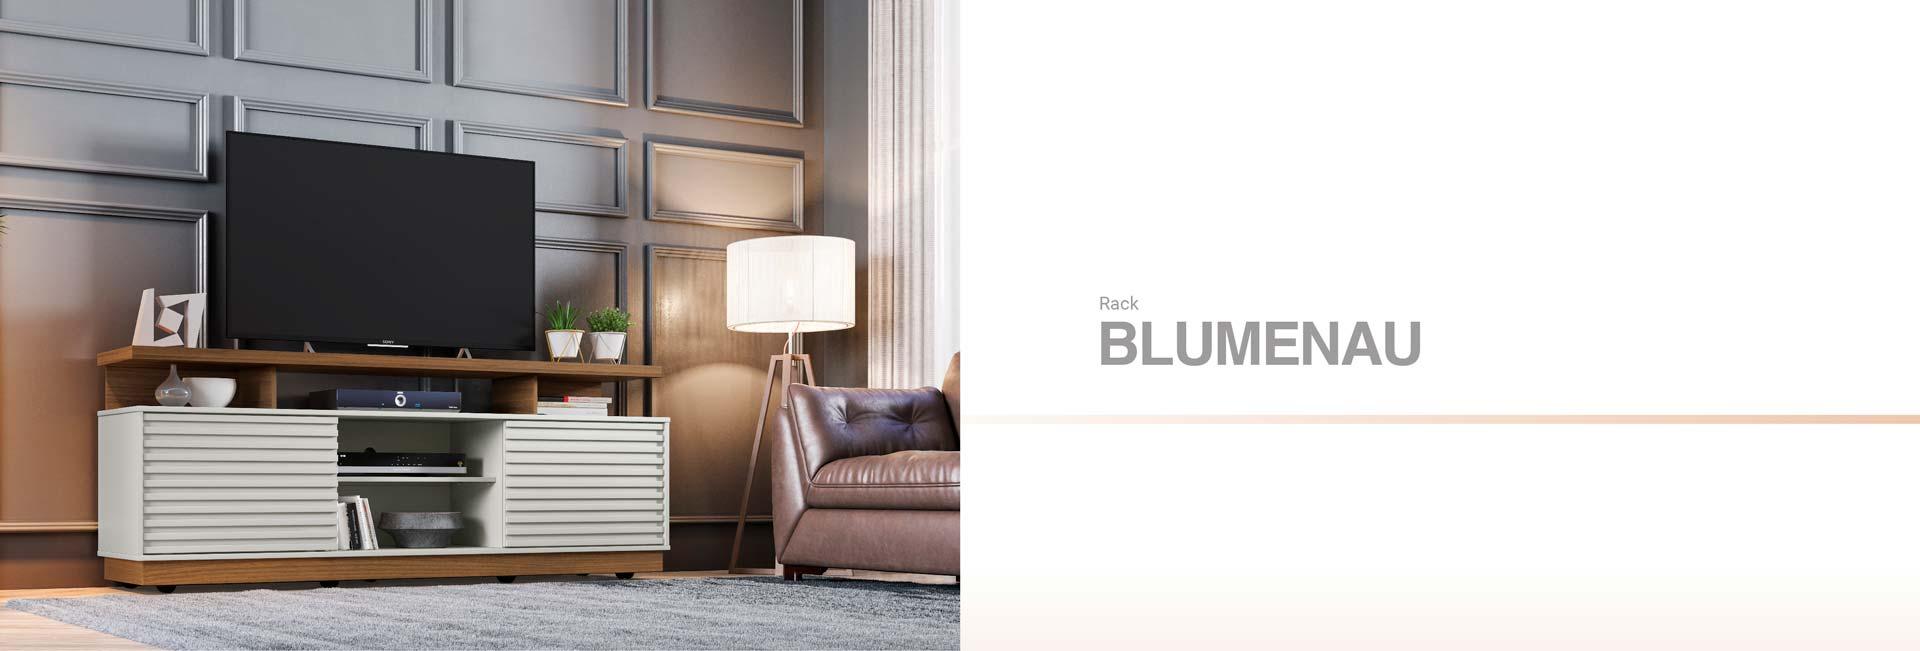 Rack para TV Blumenau